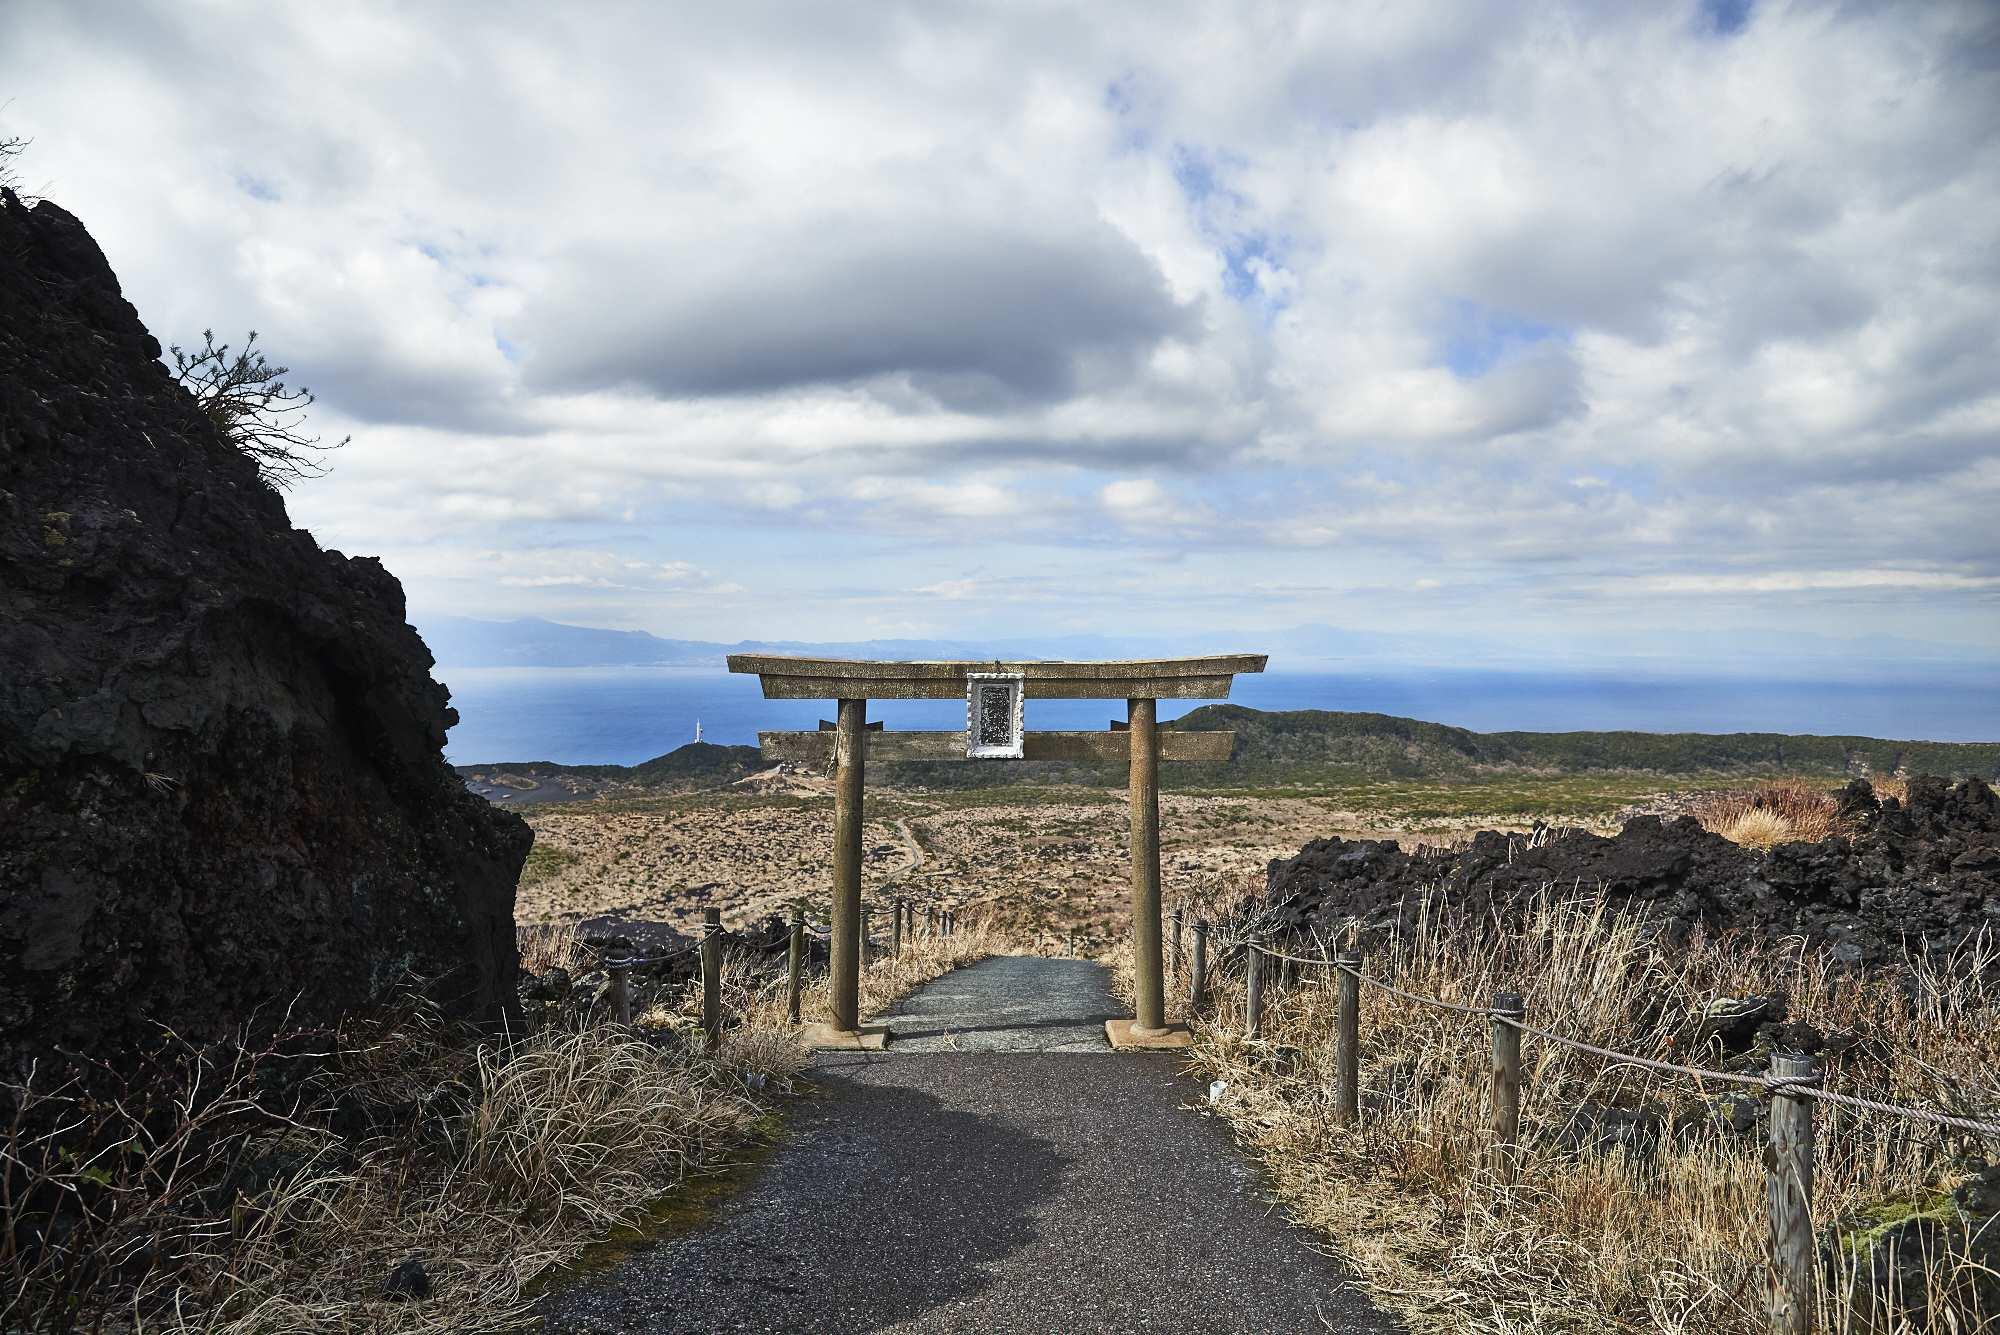 伊豆大島三原山の鳥居